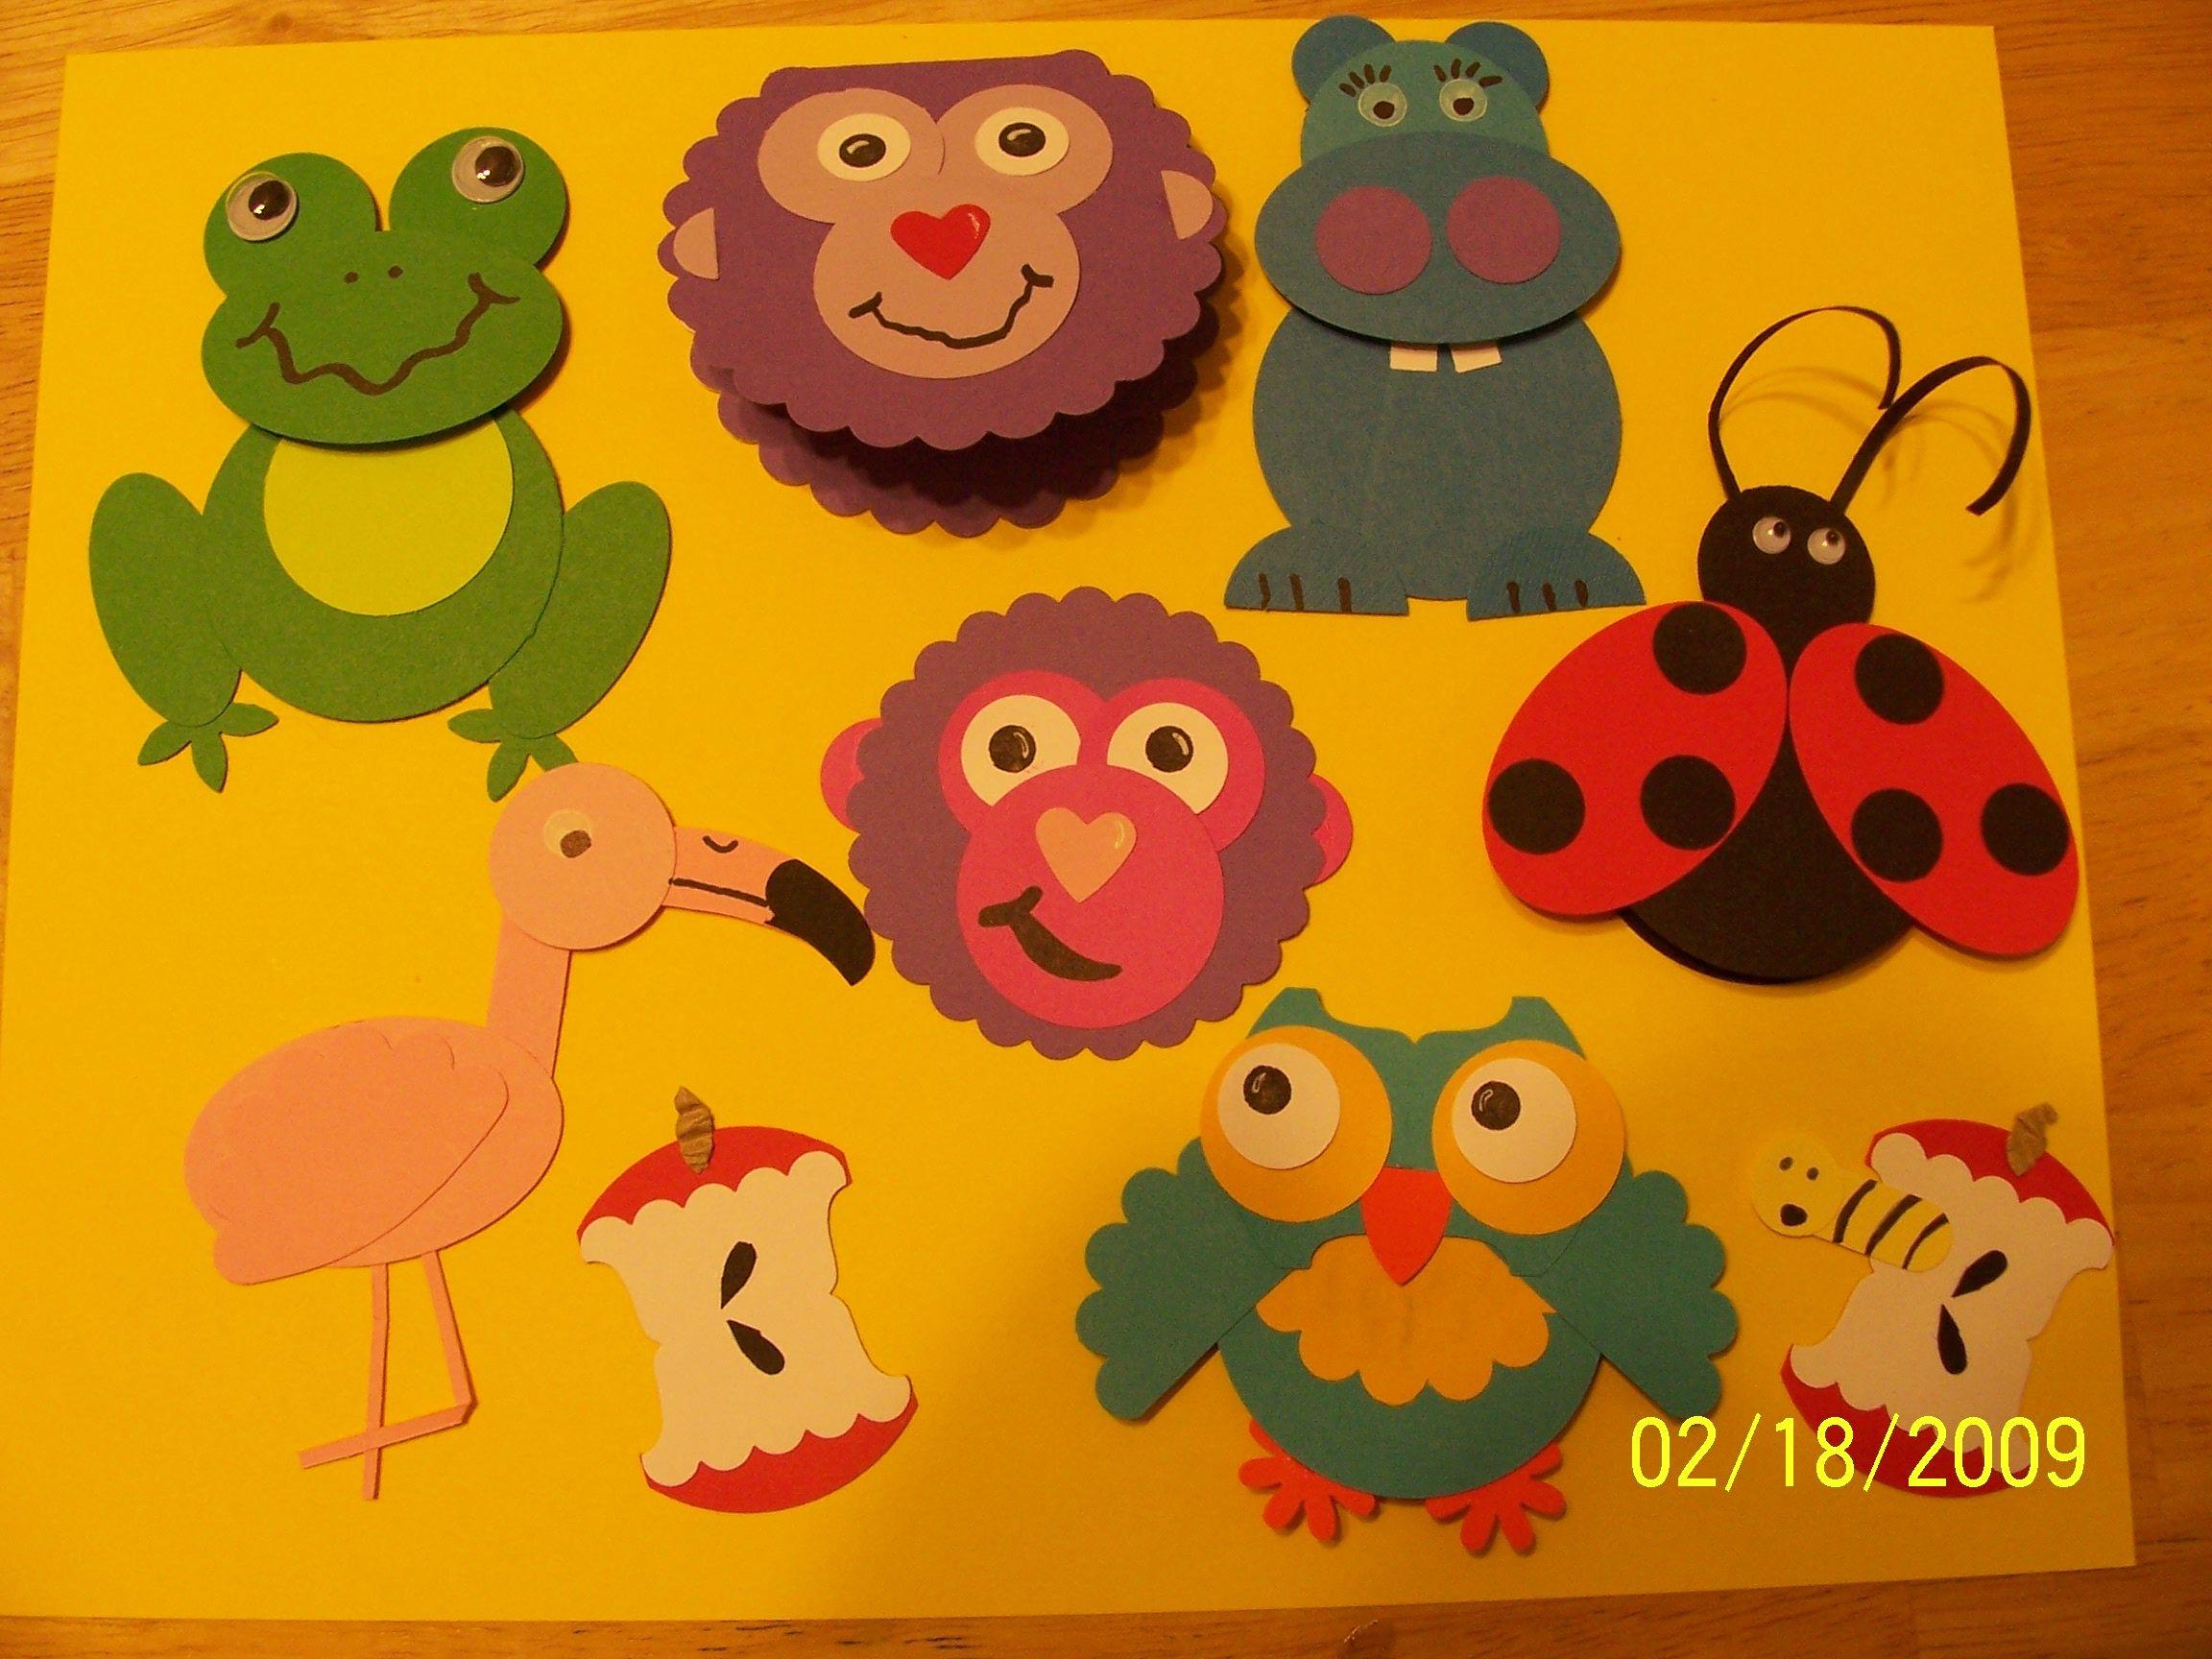 Zoo animal scrapbook ideas - Animals Made From Circles By Loristupke01 26 Feb 09